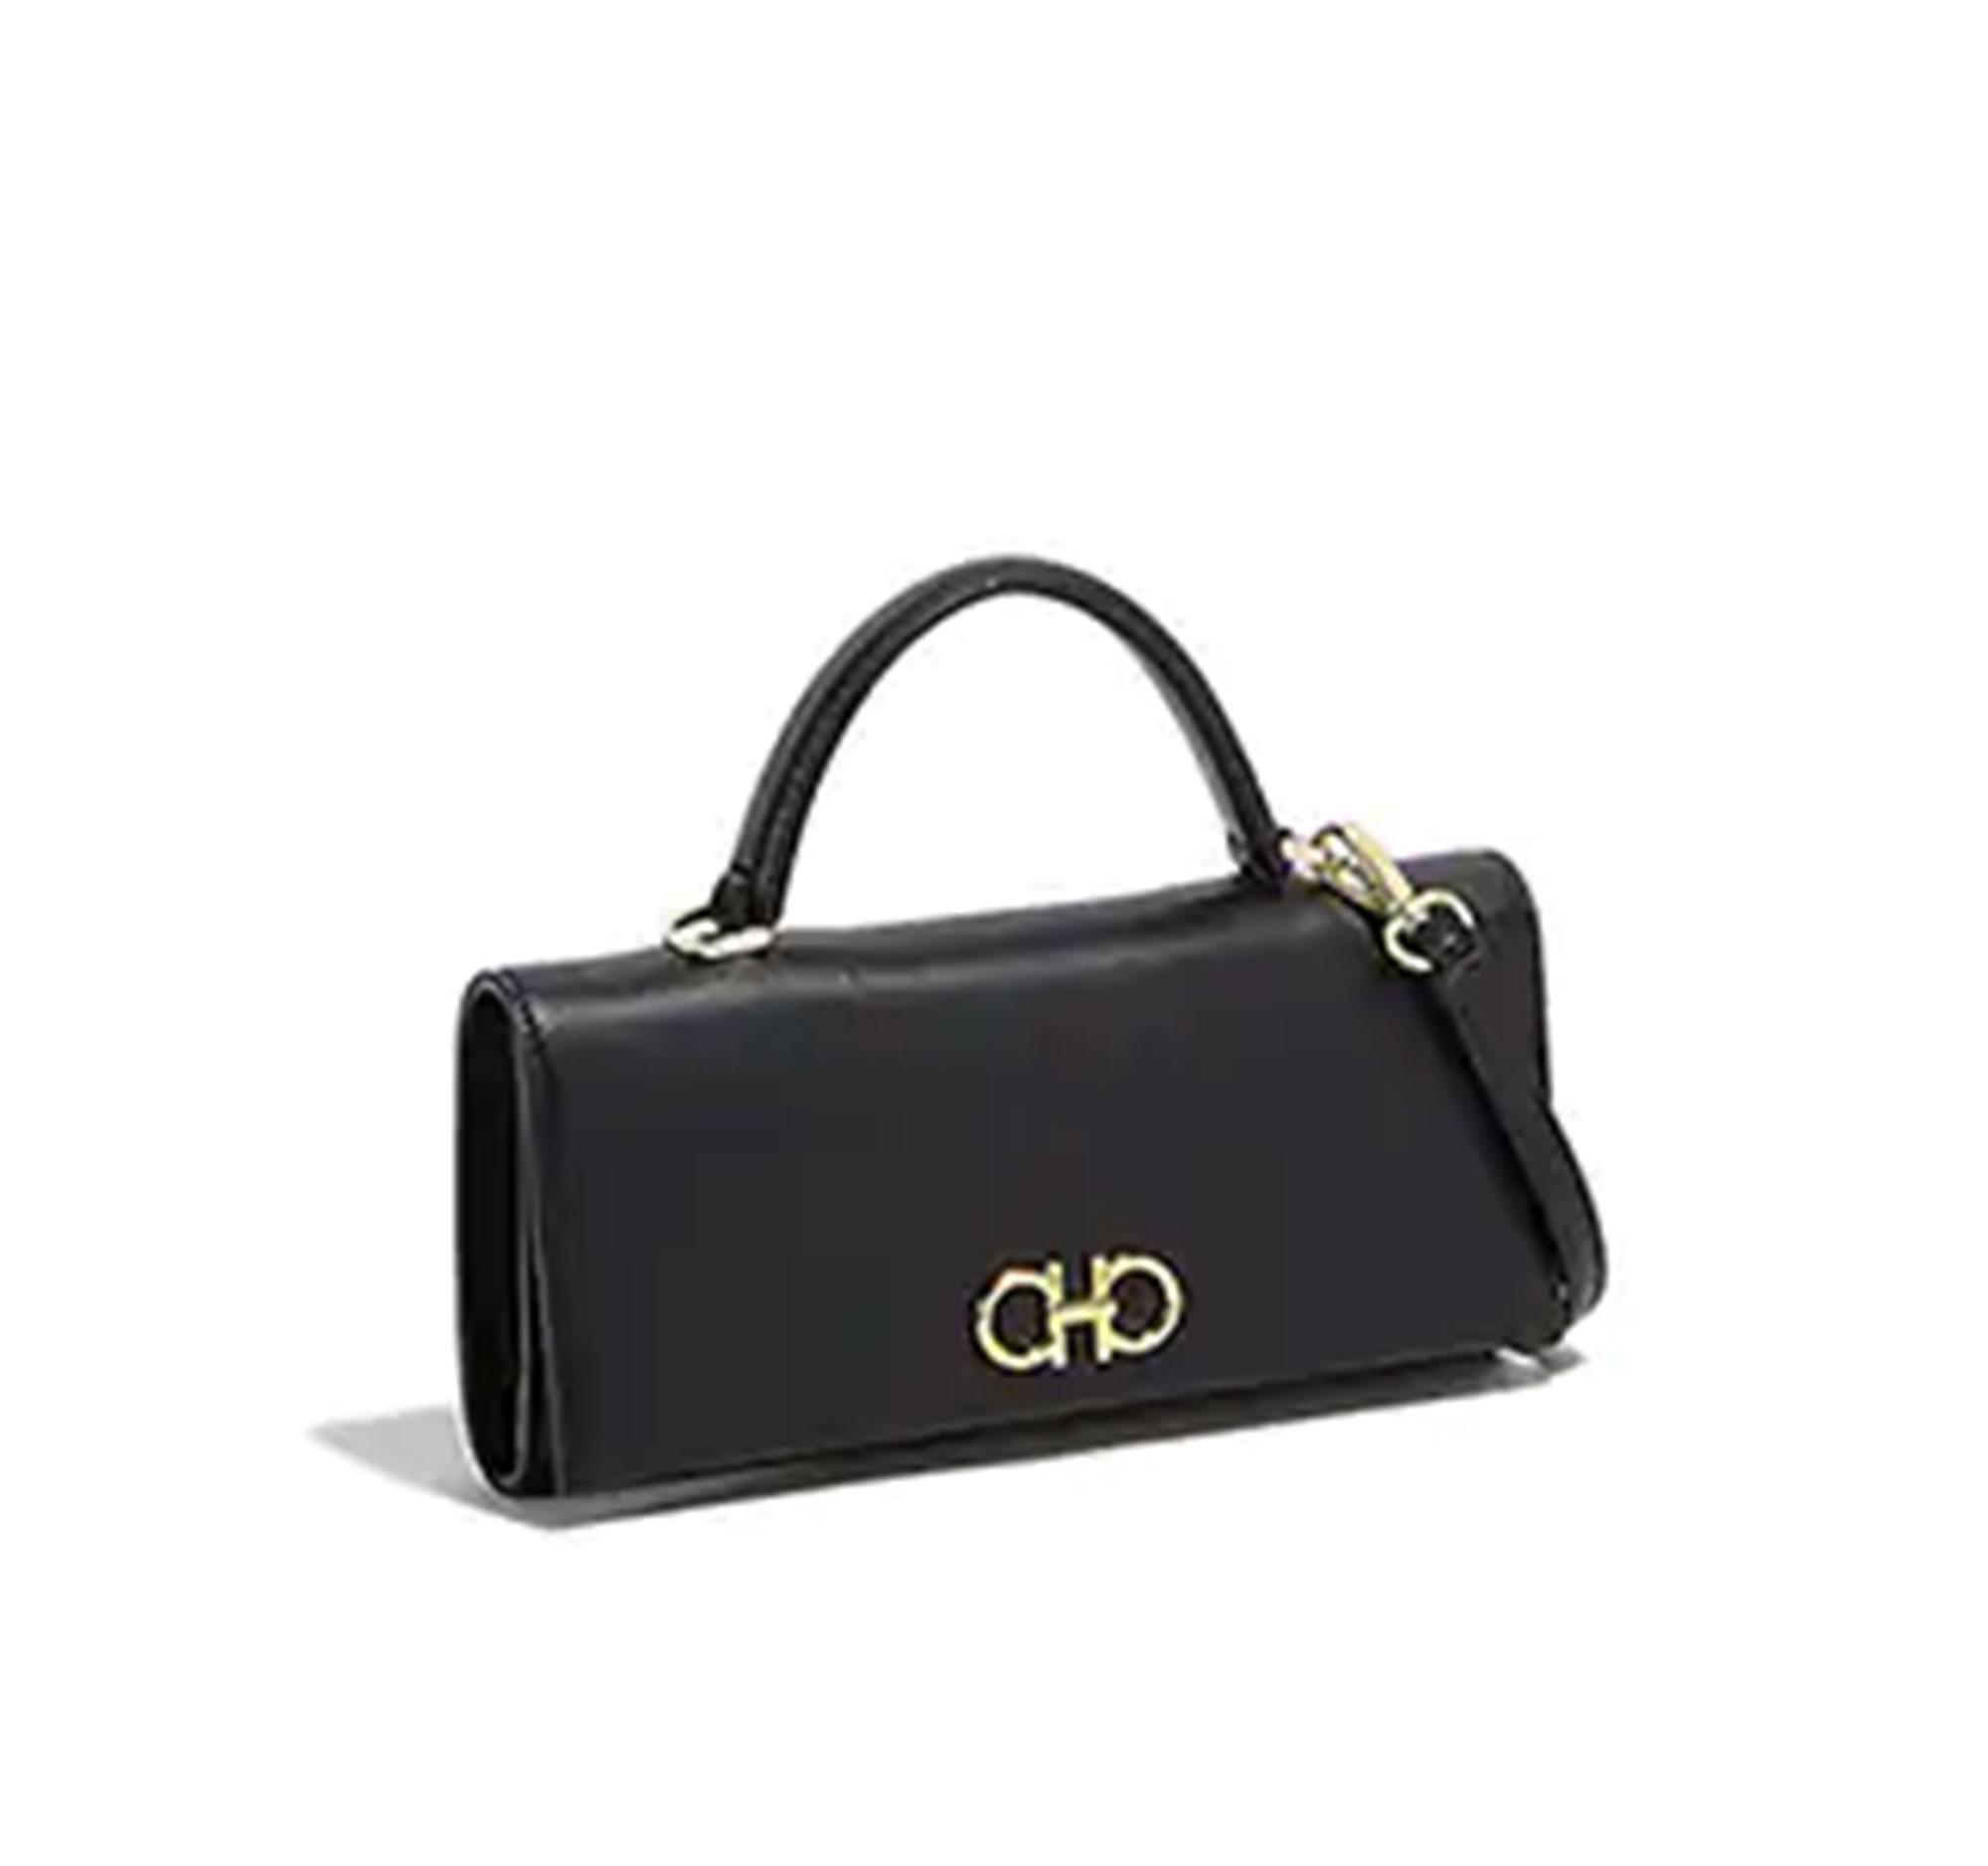 f8a2ef76b Colorful Mini Bags Inspired by Gigi Hadid's Green Purse: Shop